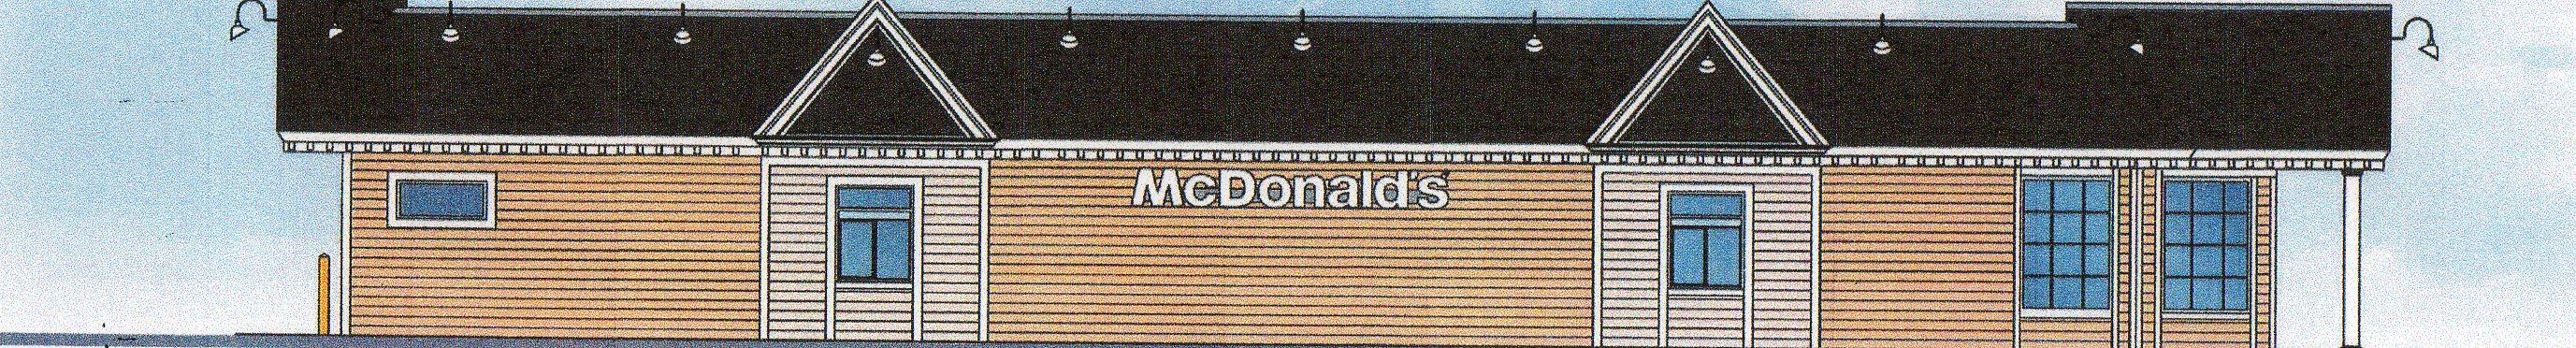 McDonalds032